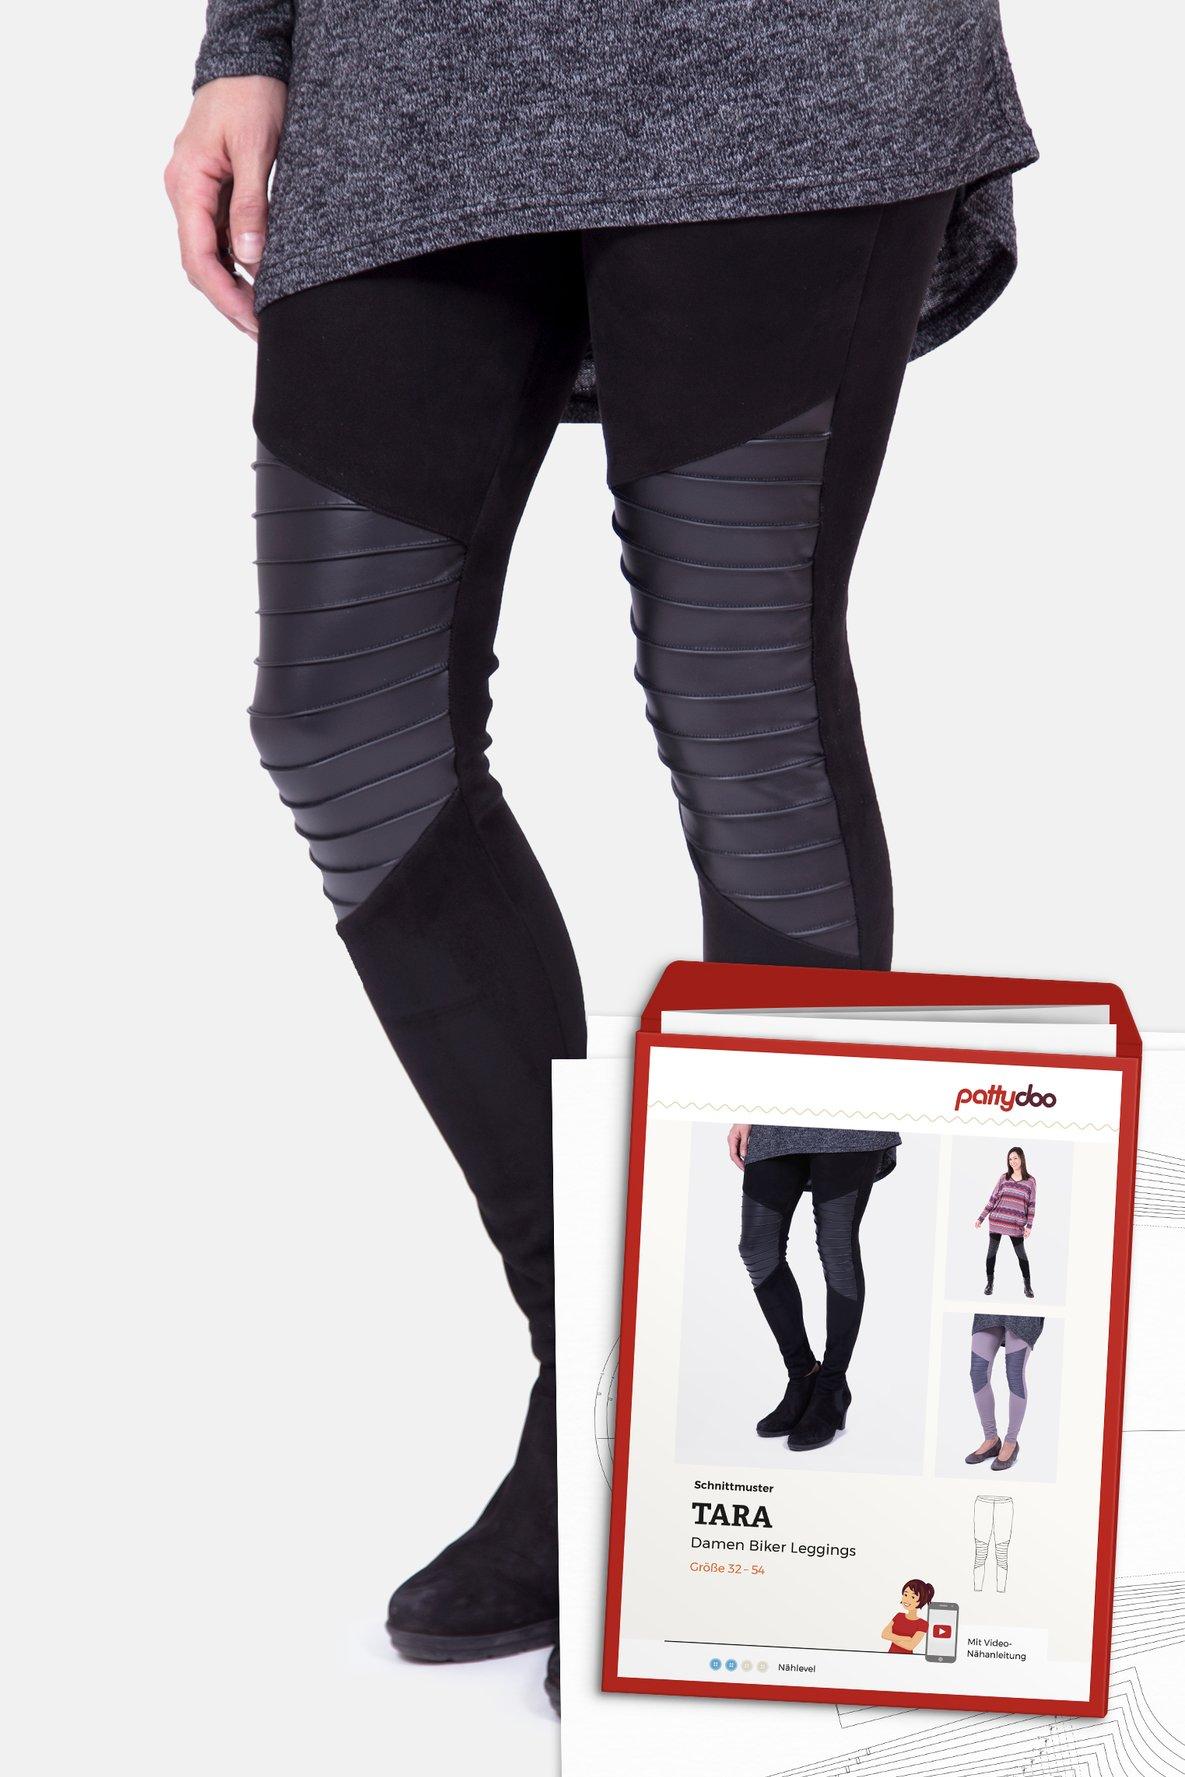 PATTYDOO Tara Biker Leggings Damen Papierschnittmuster